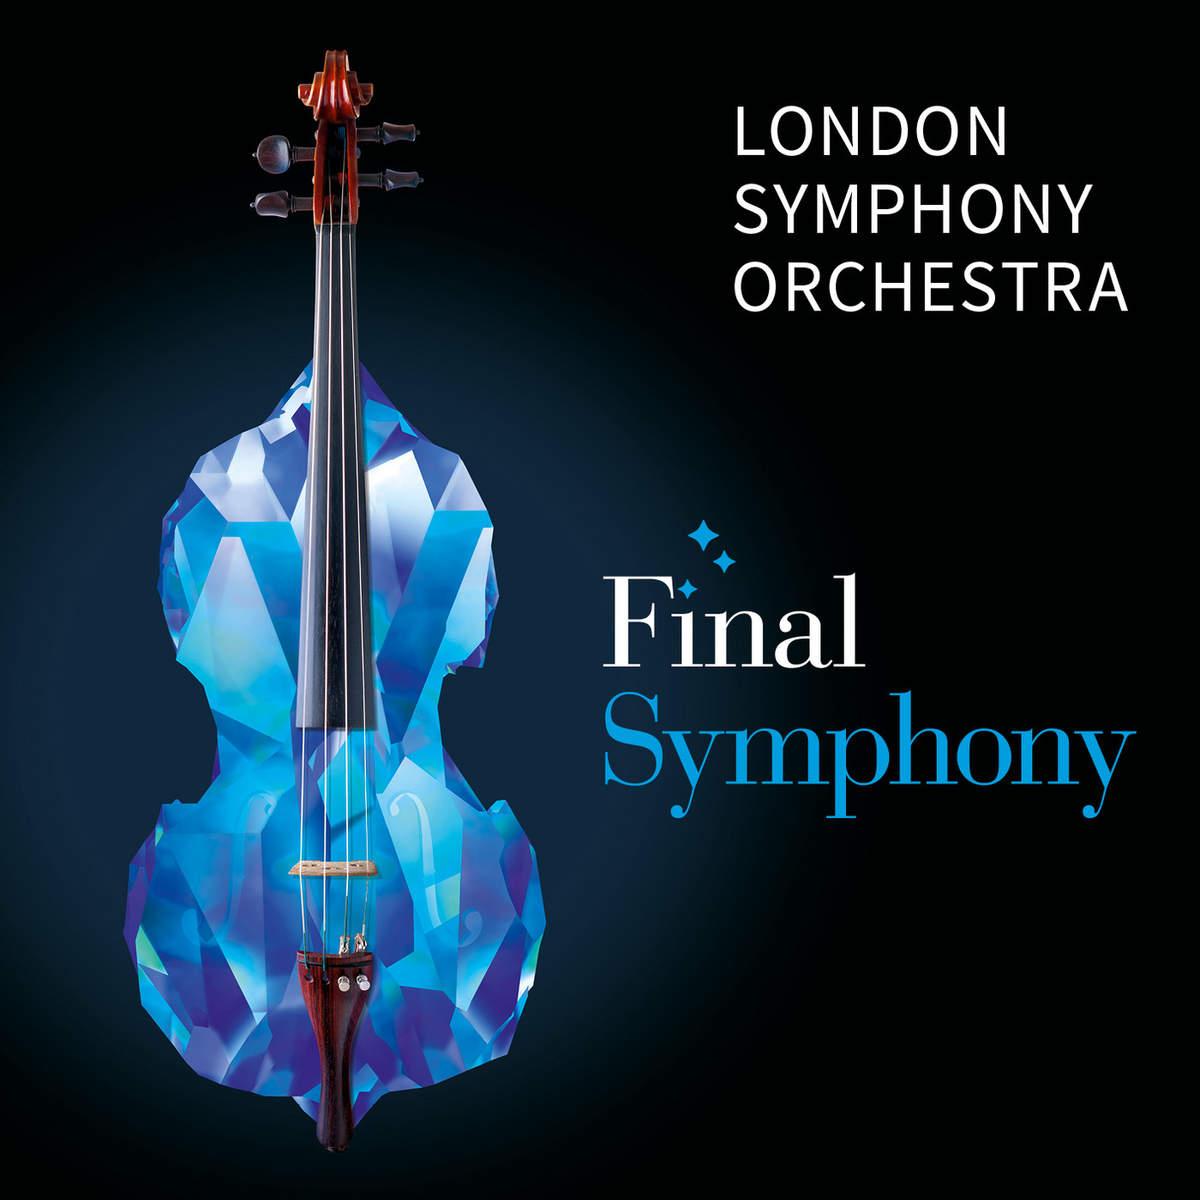 final_symphony__image1200x1200.jpeg